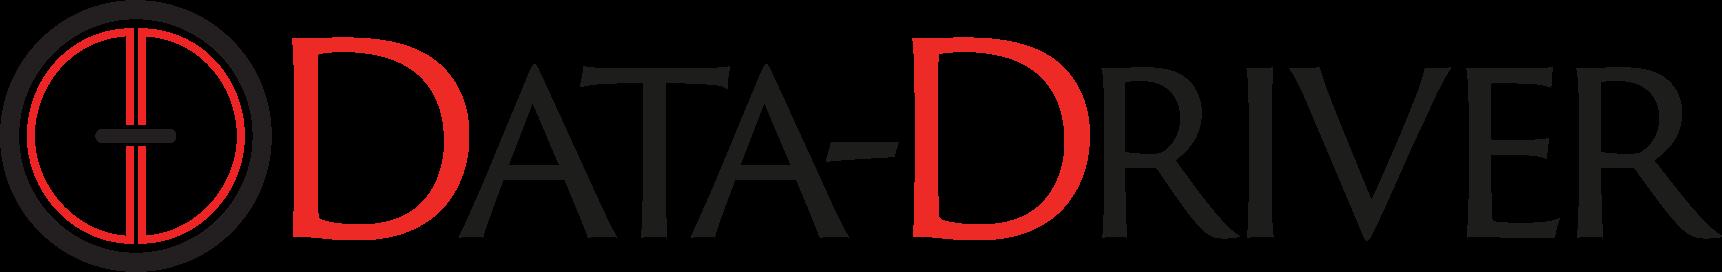 dd logo - sbs br.png